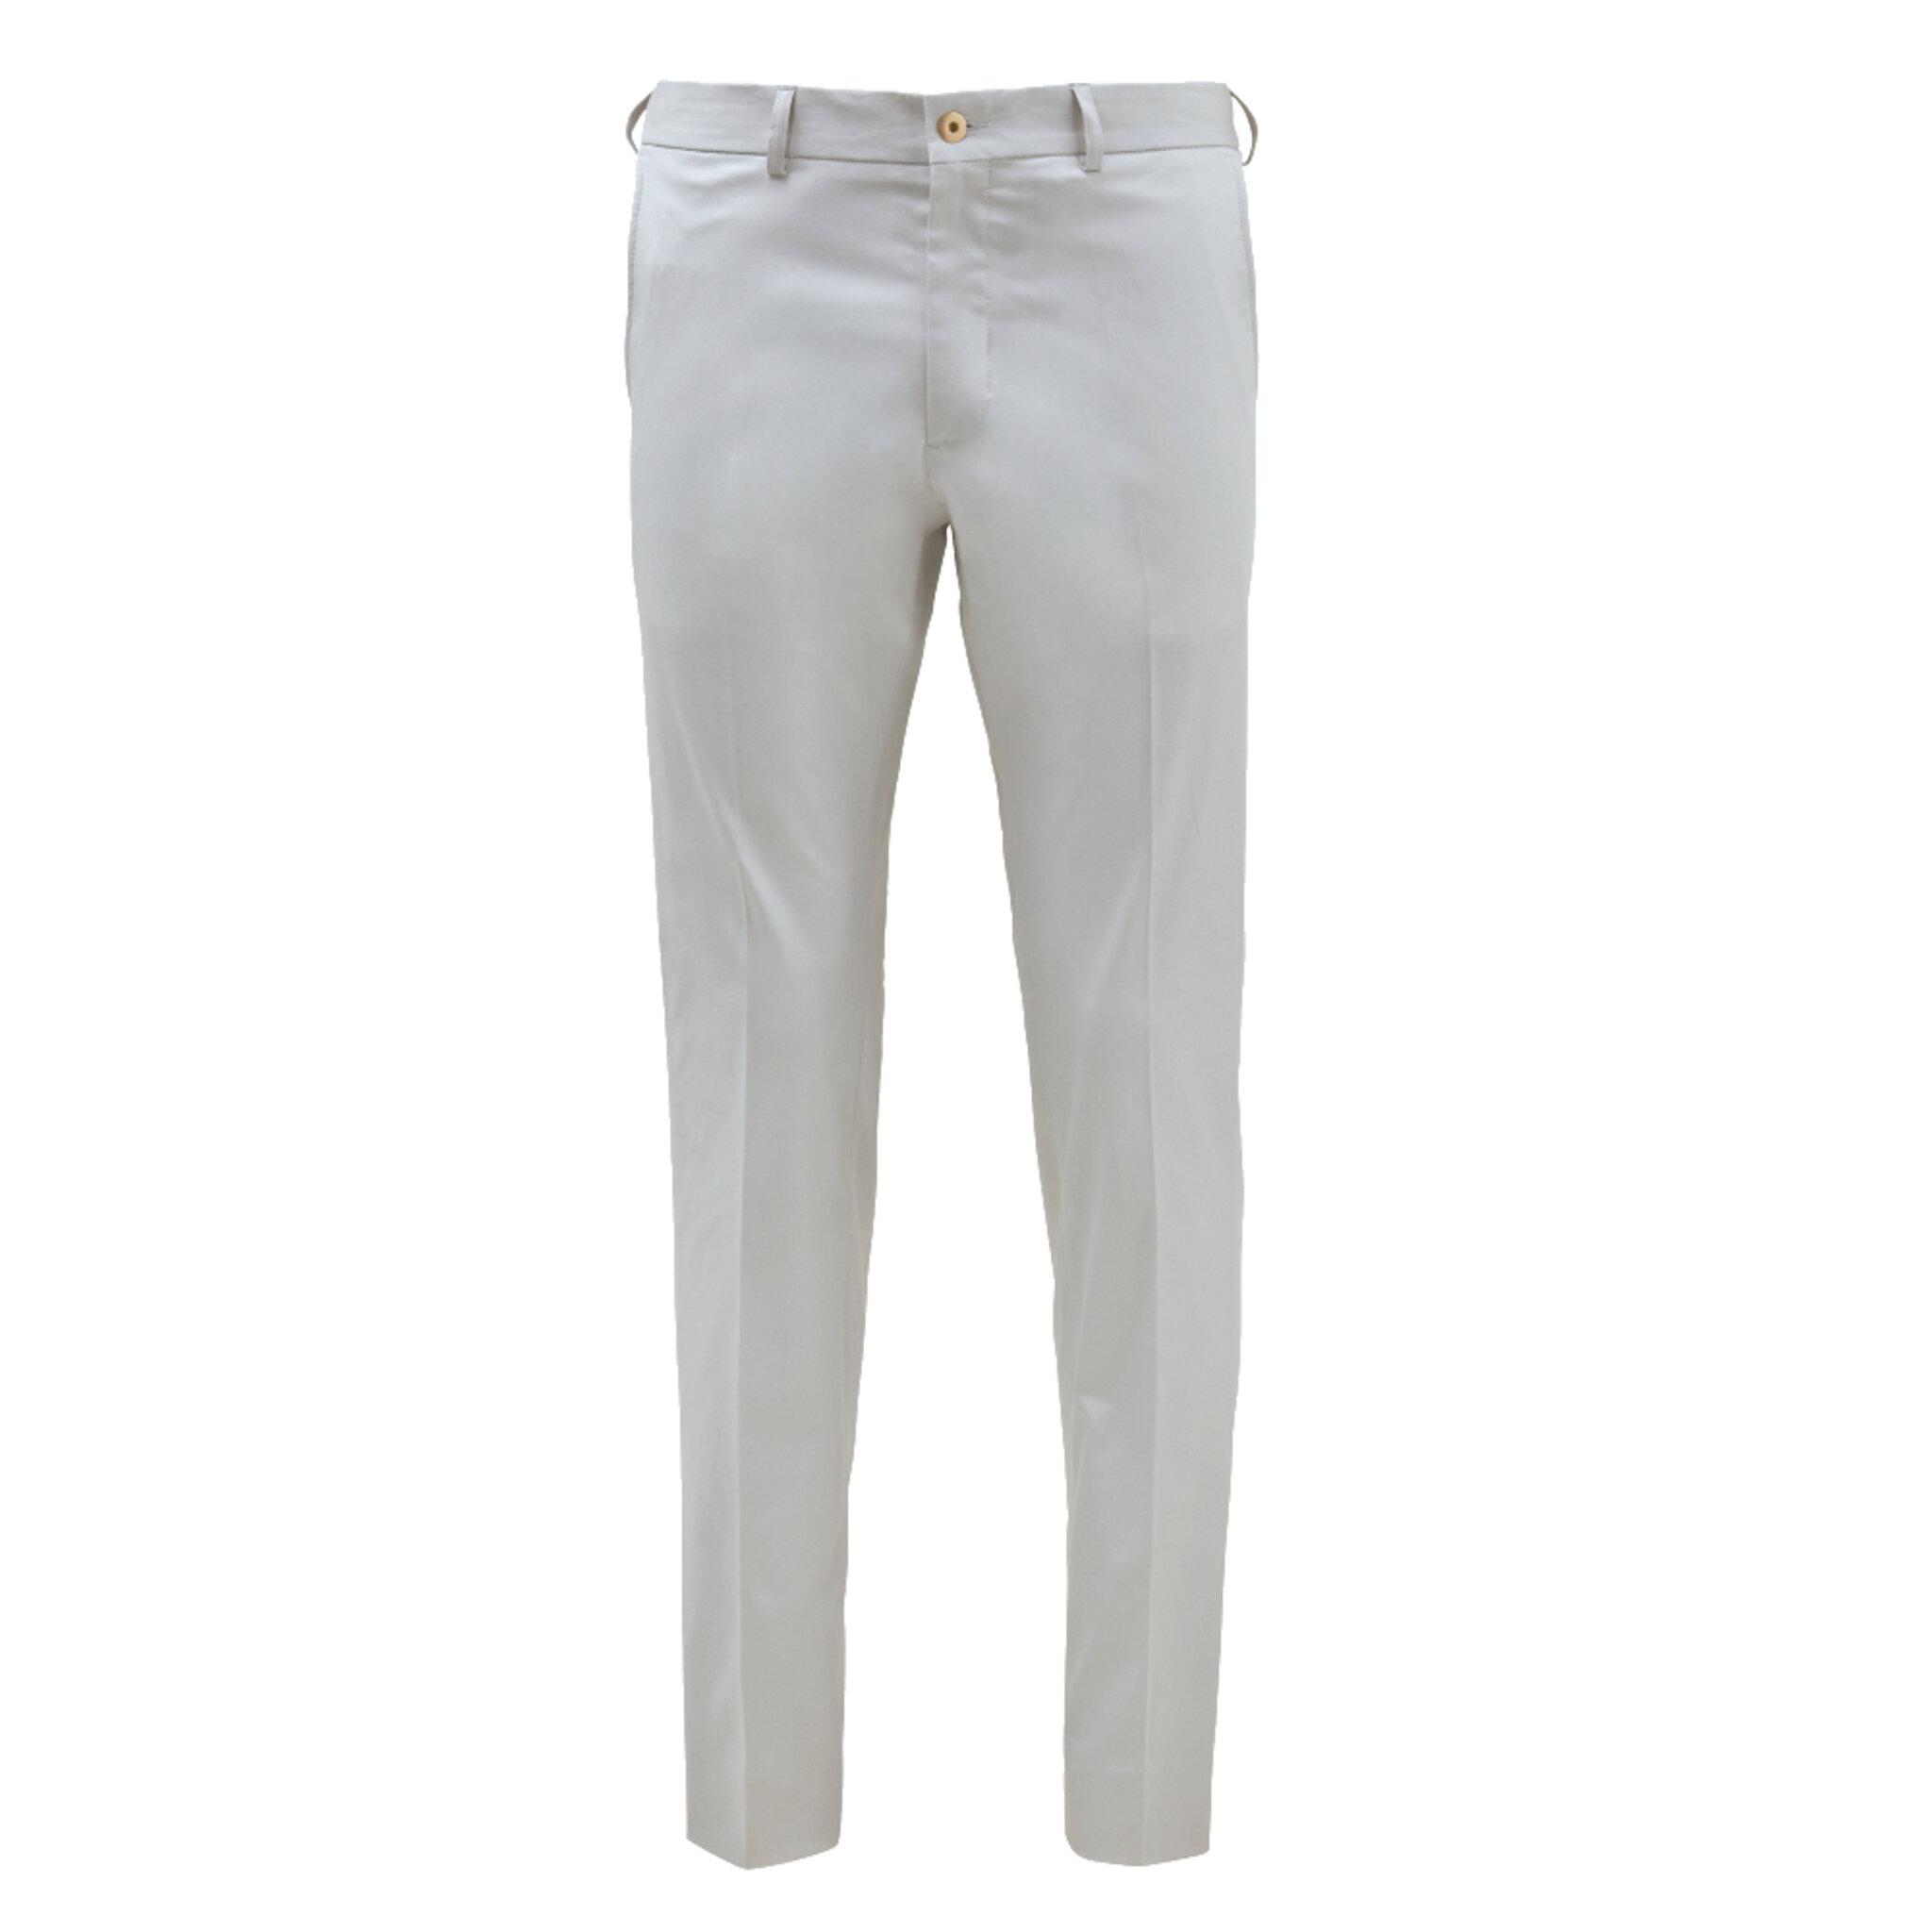 Jake Slim Fit Cotton Stretch Trouser